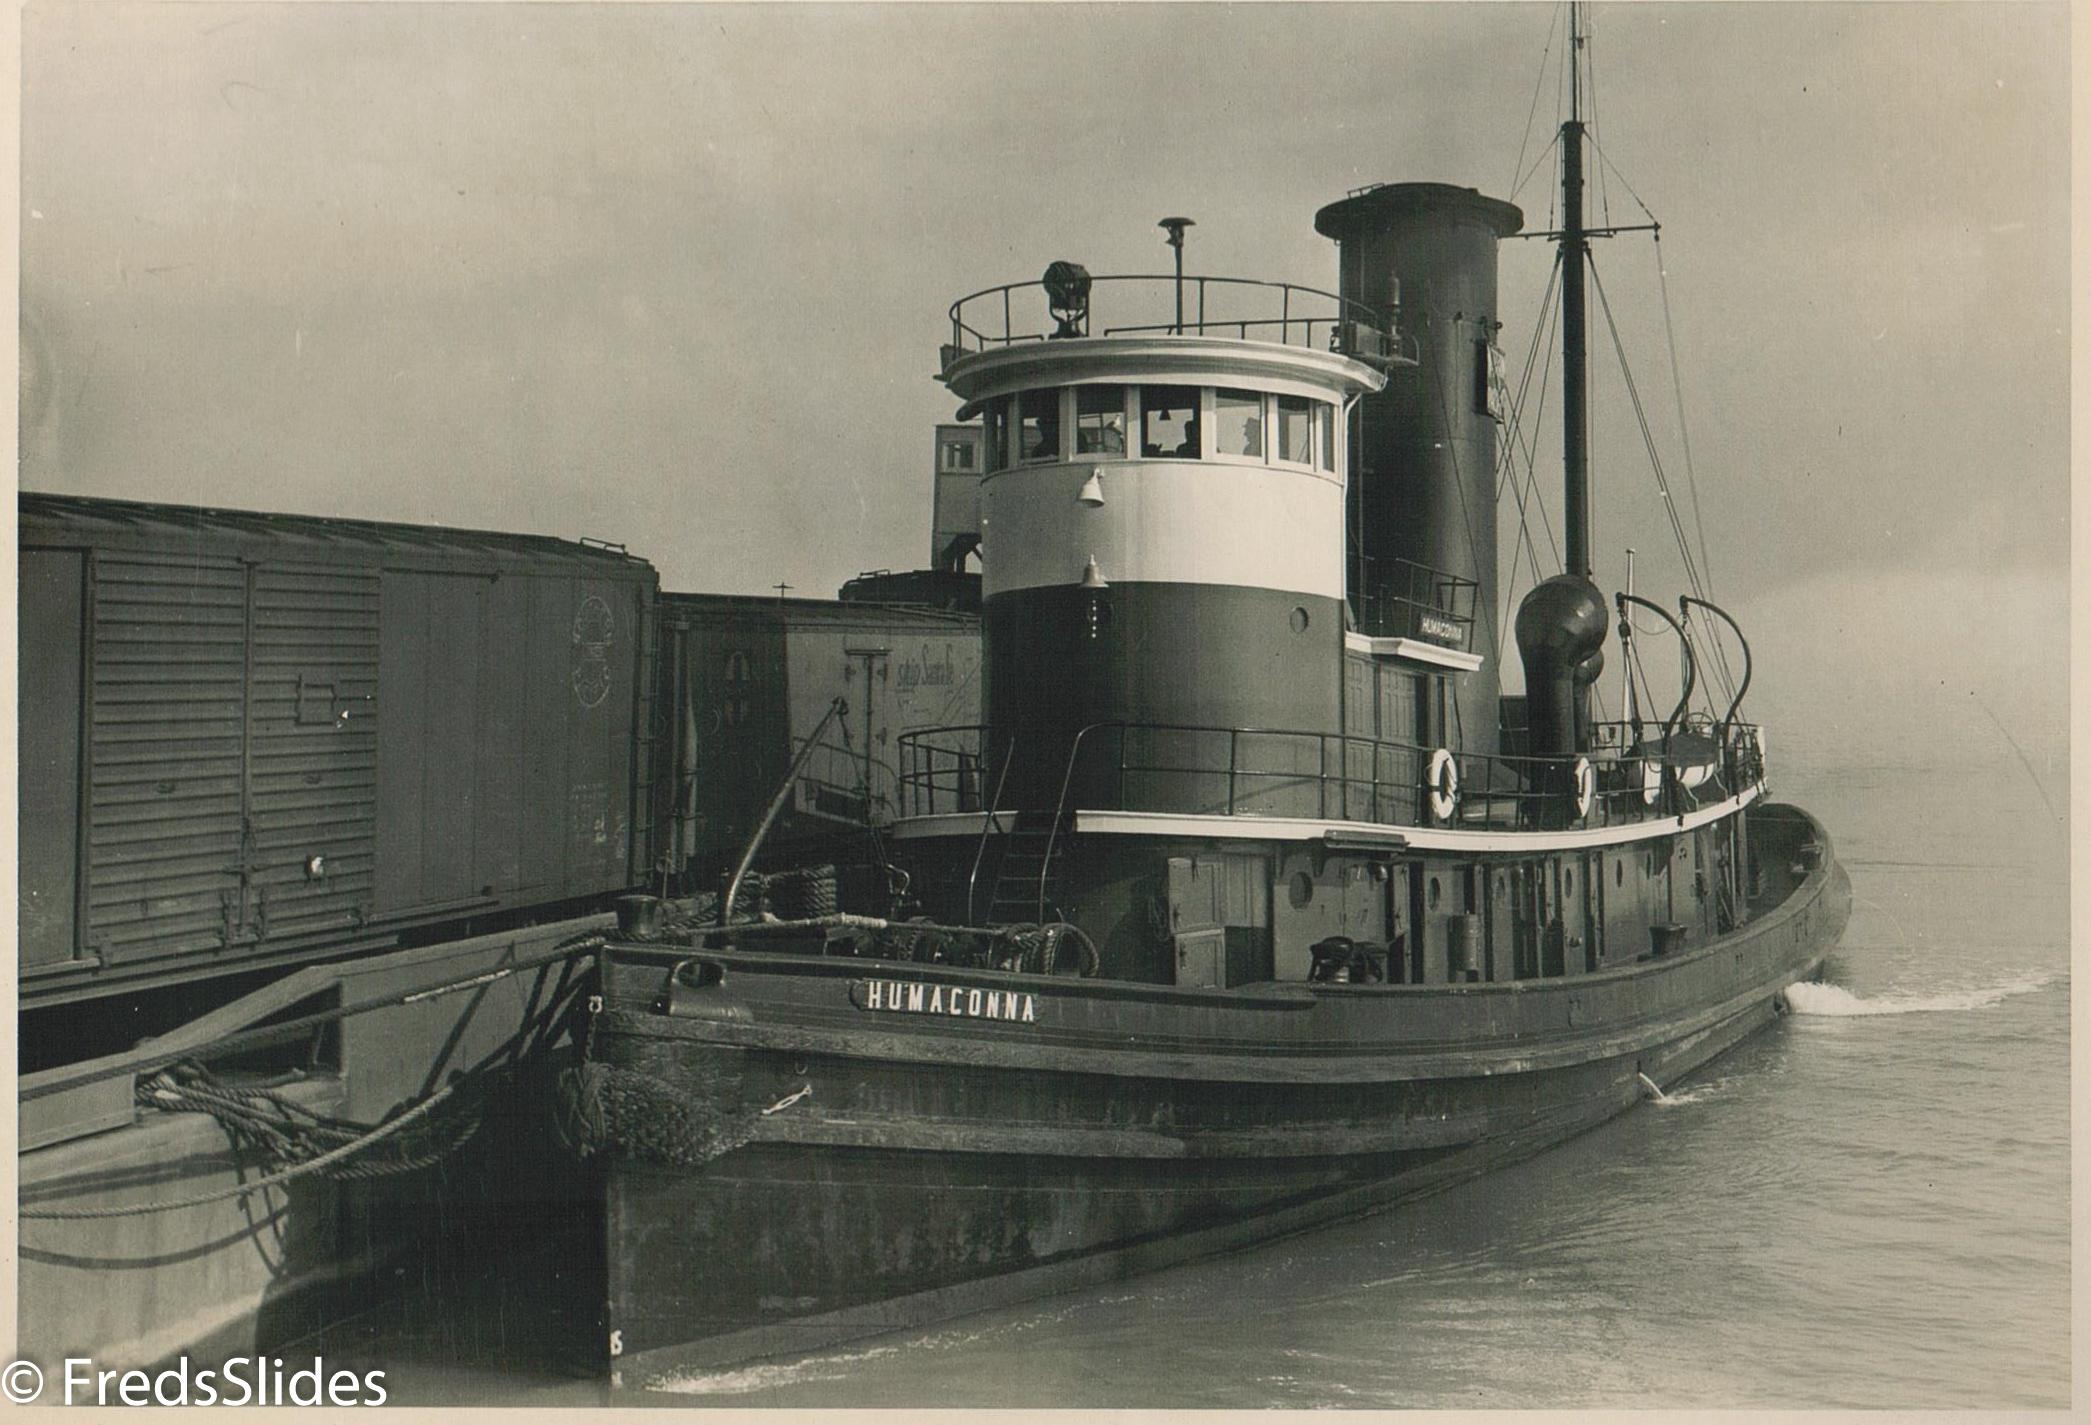 Tug Boat Humaconna Entering the slips at 25st , November 1946. Photo by WM A. Pennington Engineer Western Division